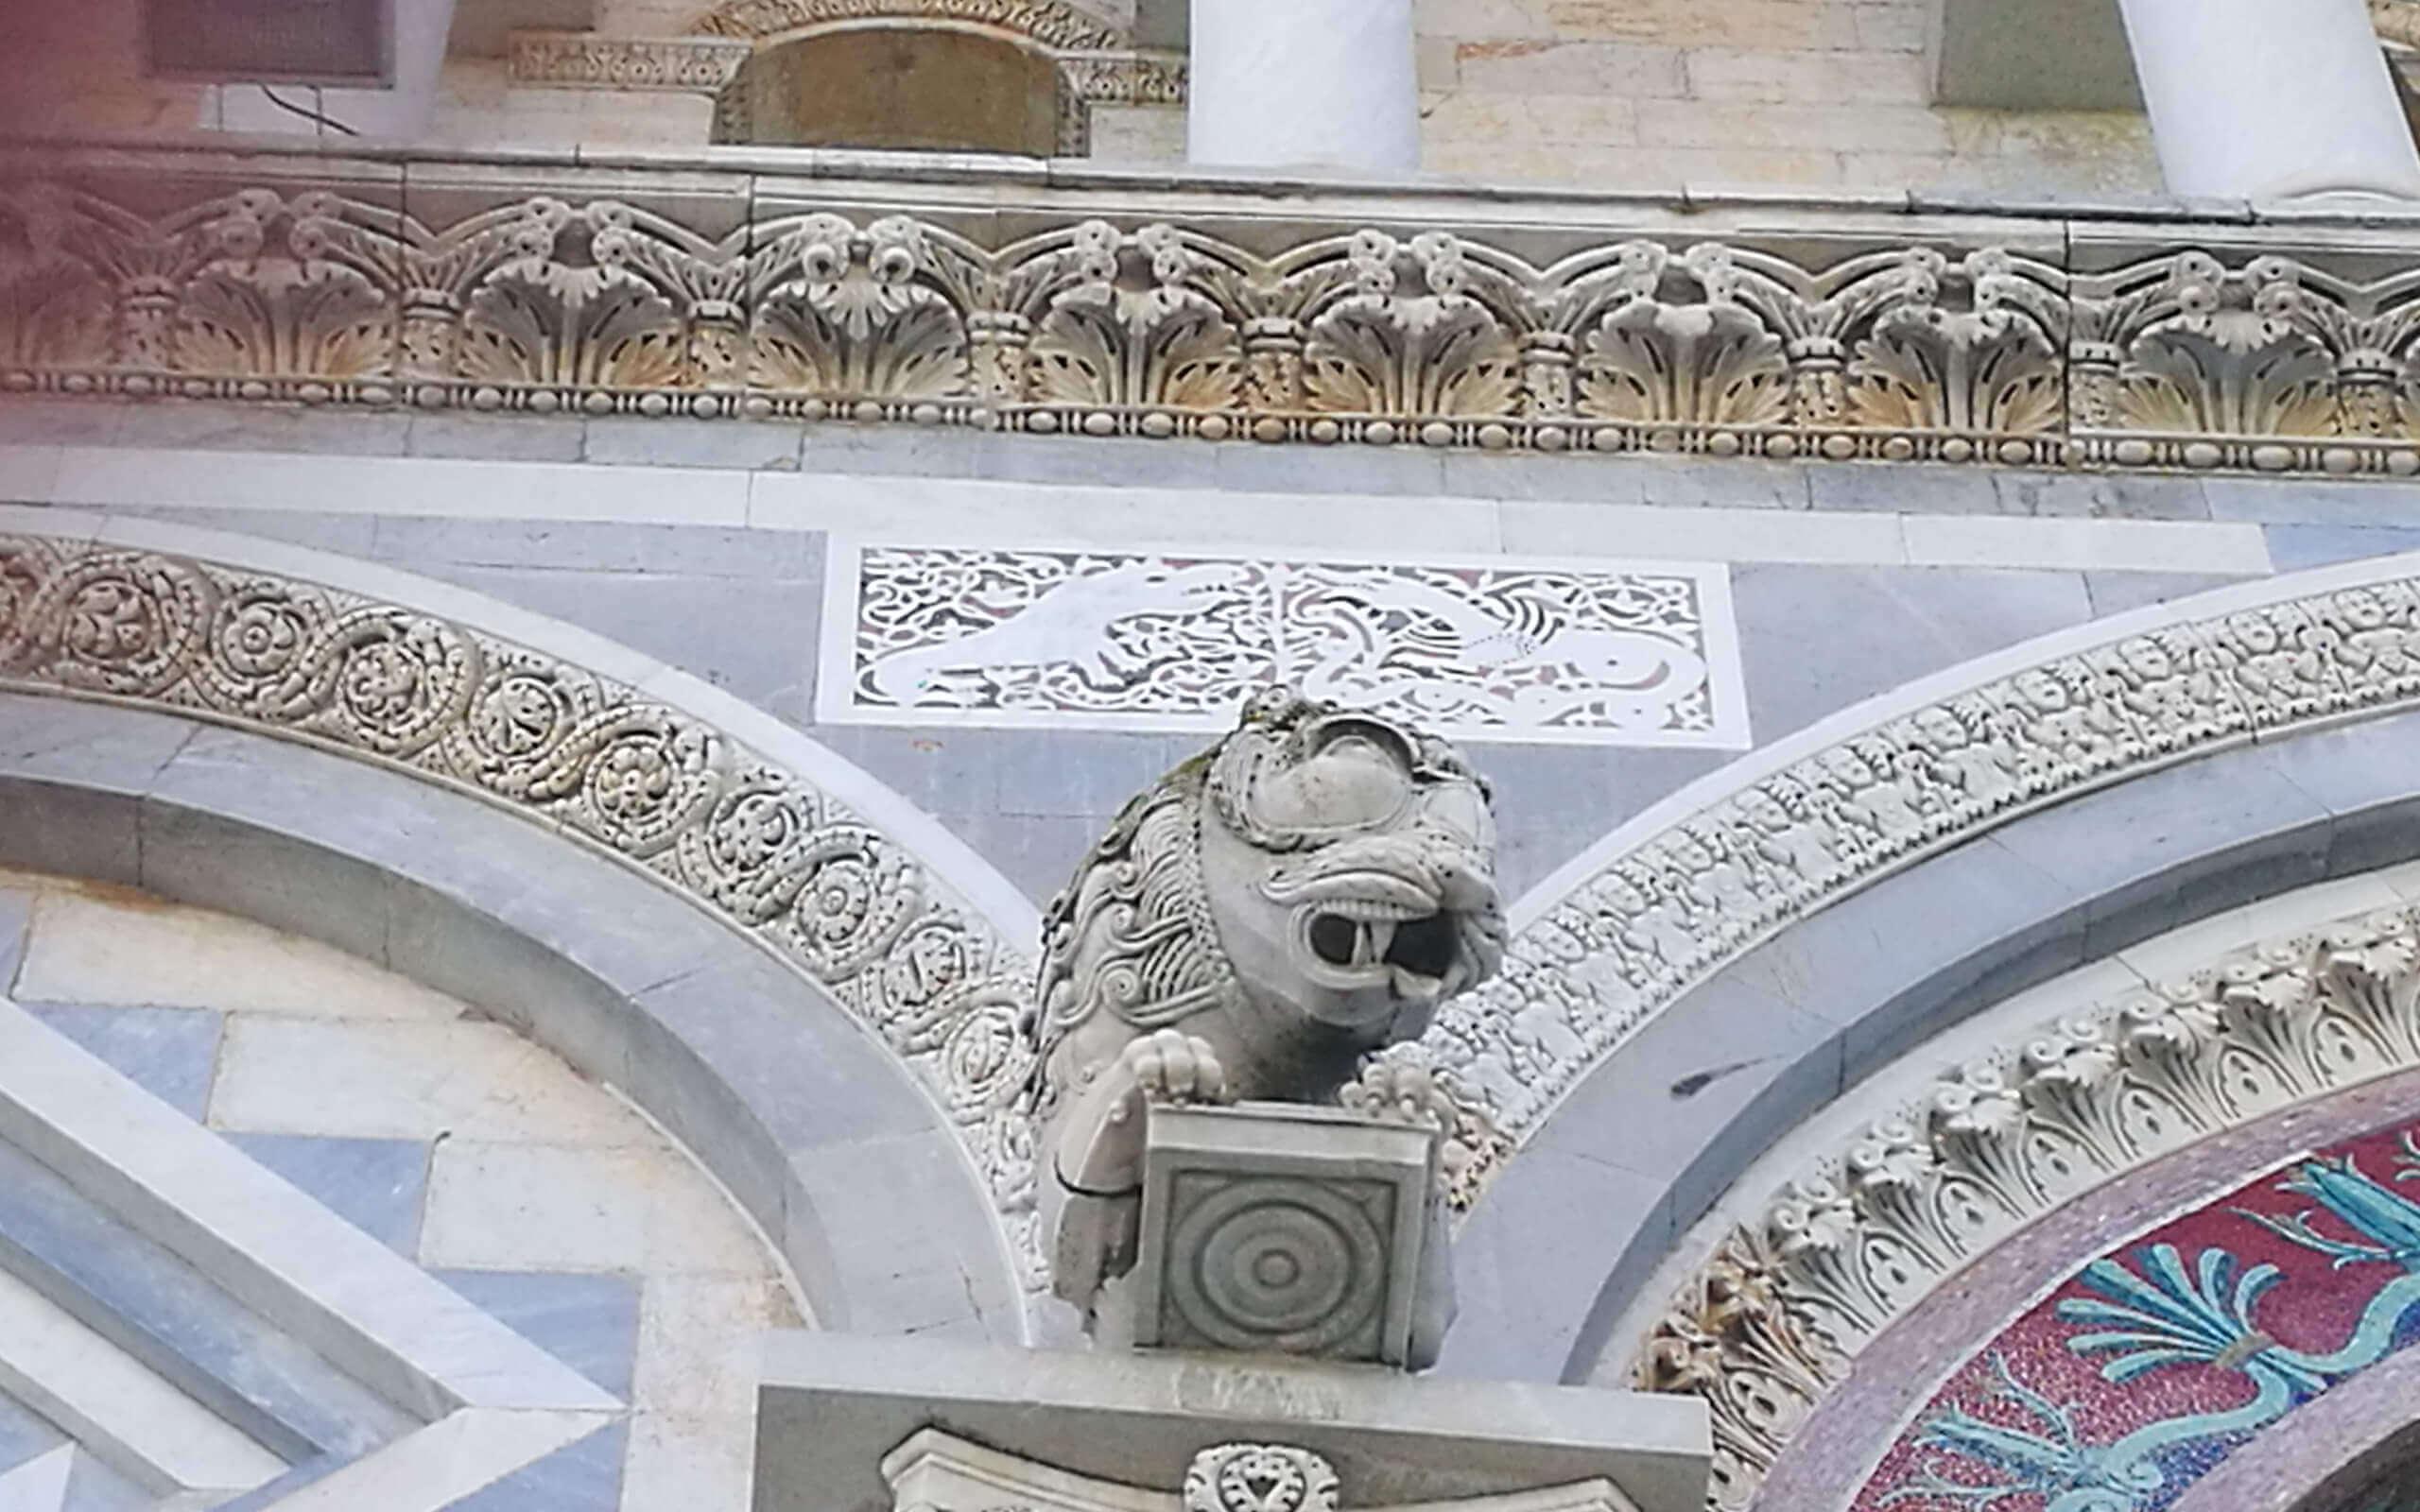 Tuscanyatheart_animal hunt in Pisa4